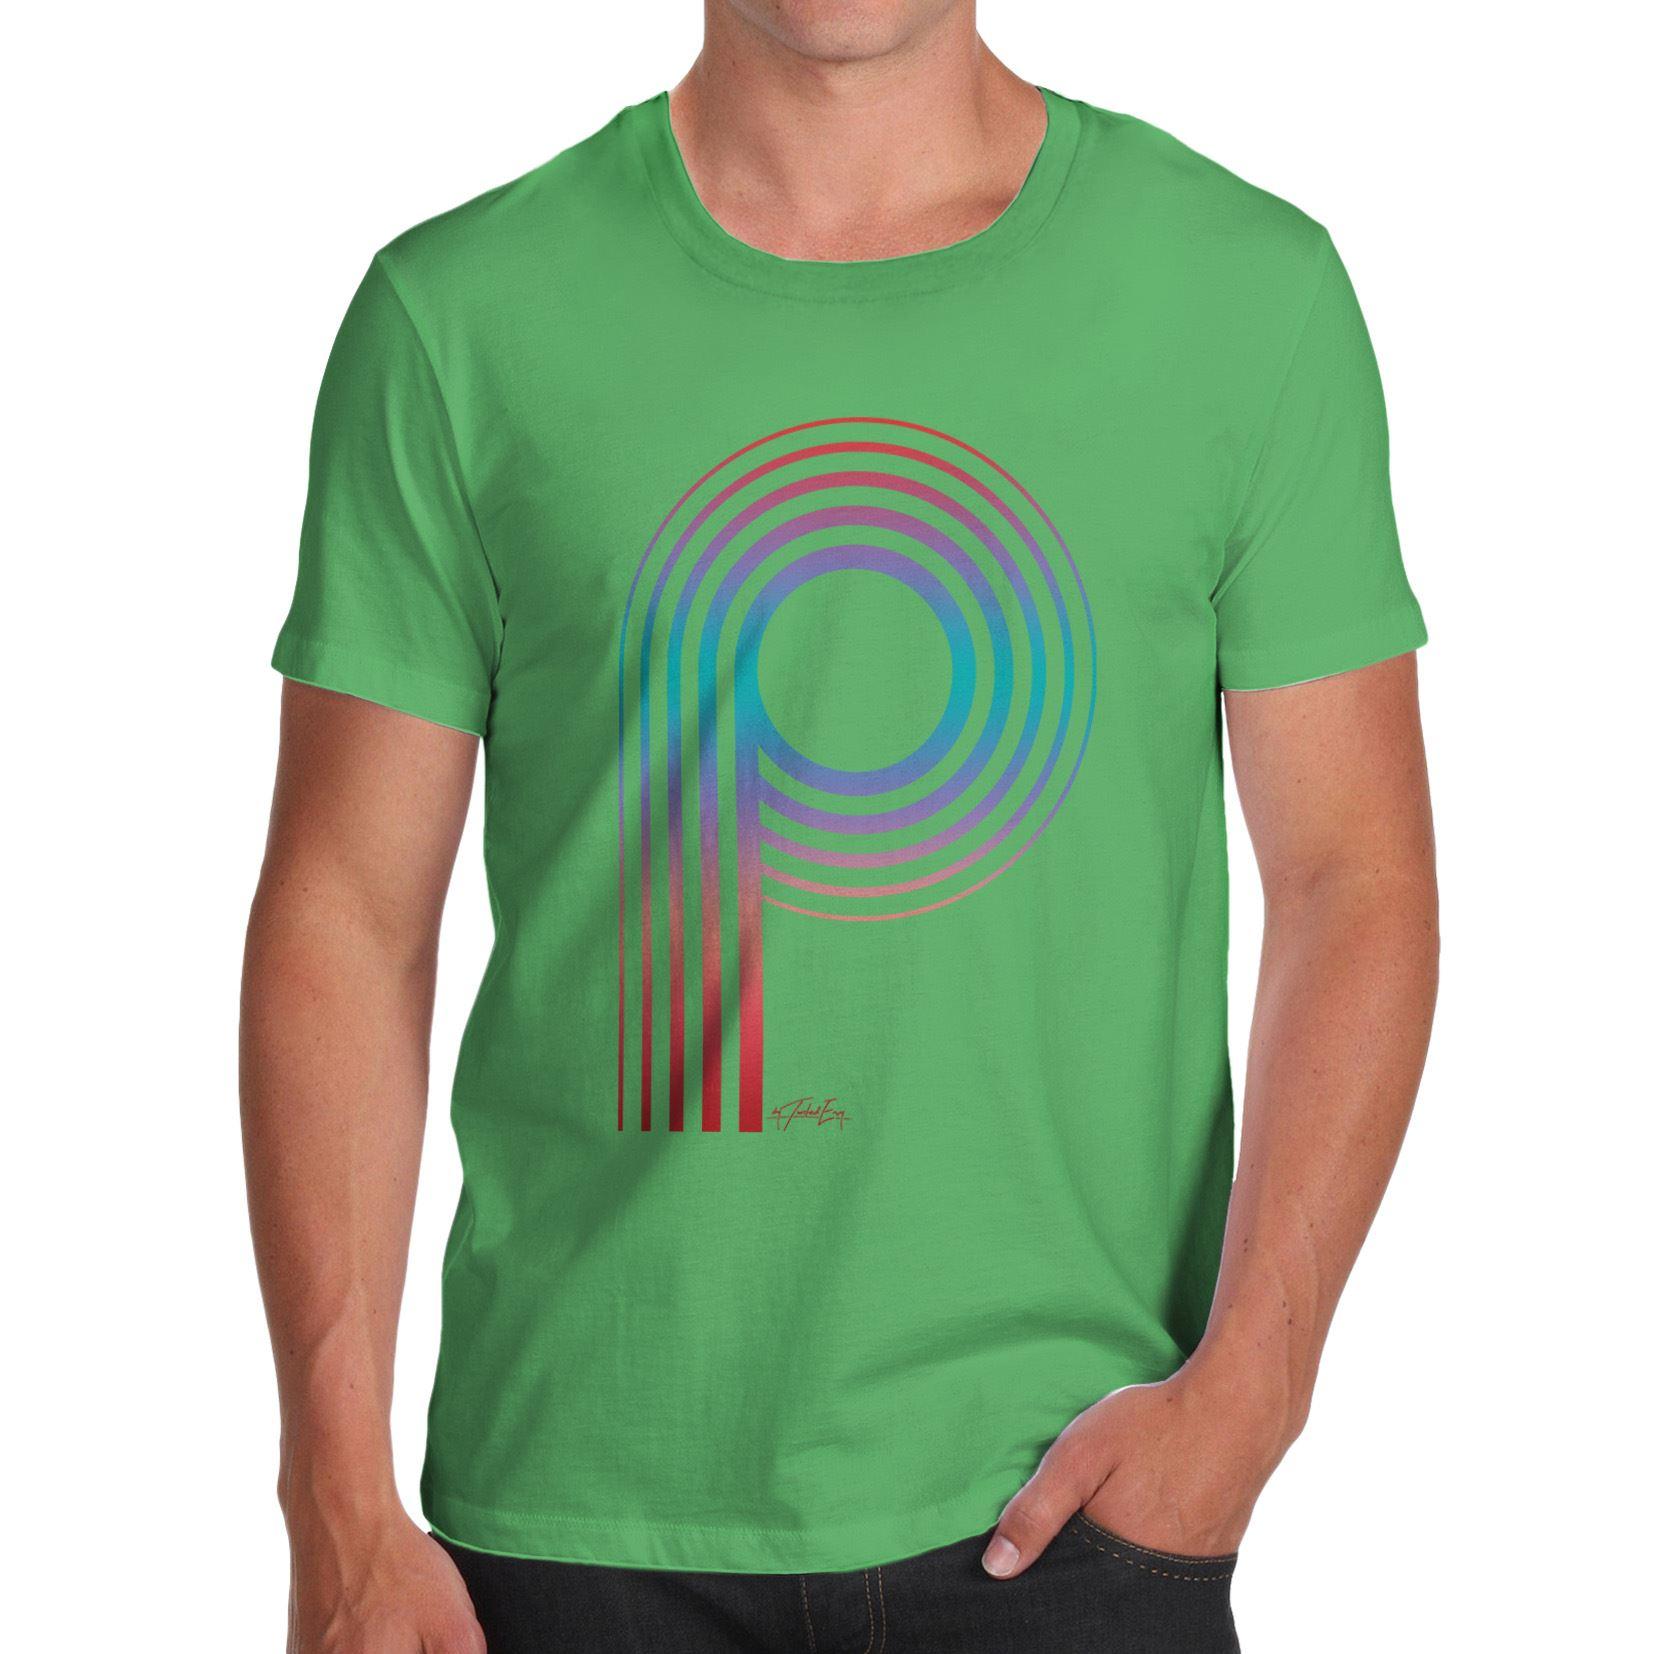 Twisted ENVY GIRL/'S Monogramma Alfabeto Lettera S T-shirt